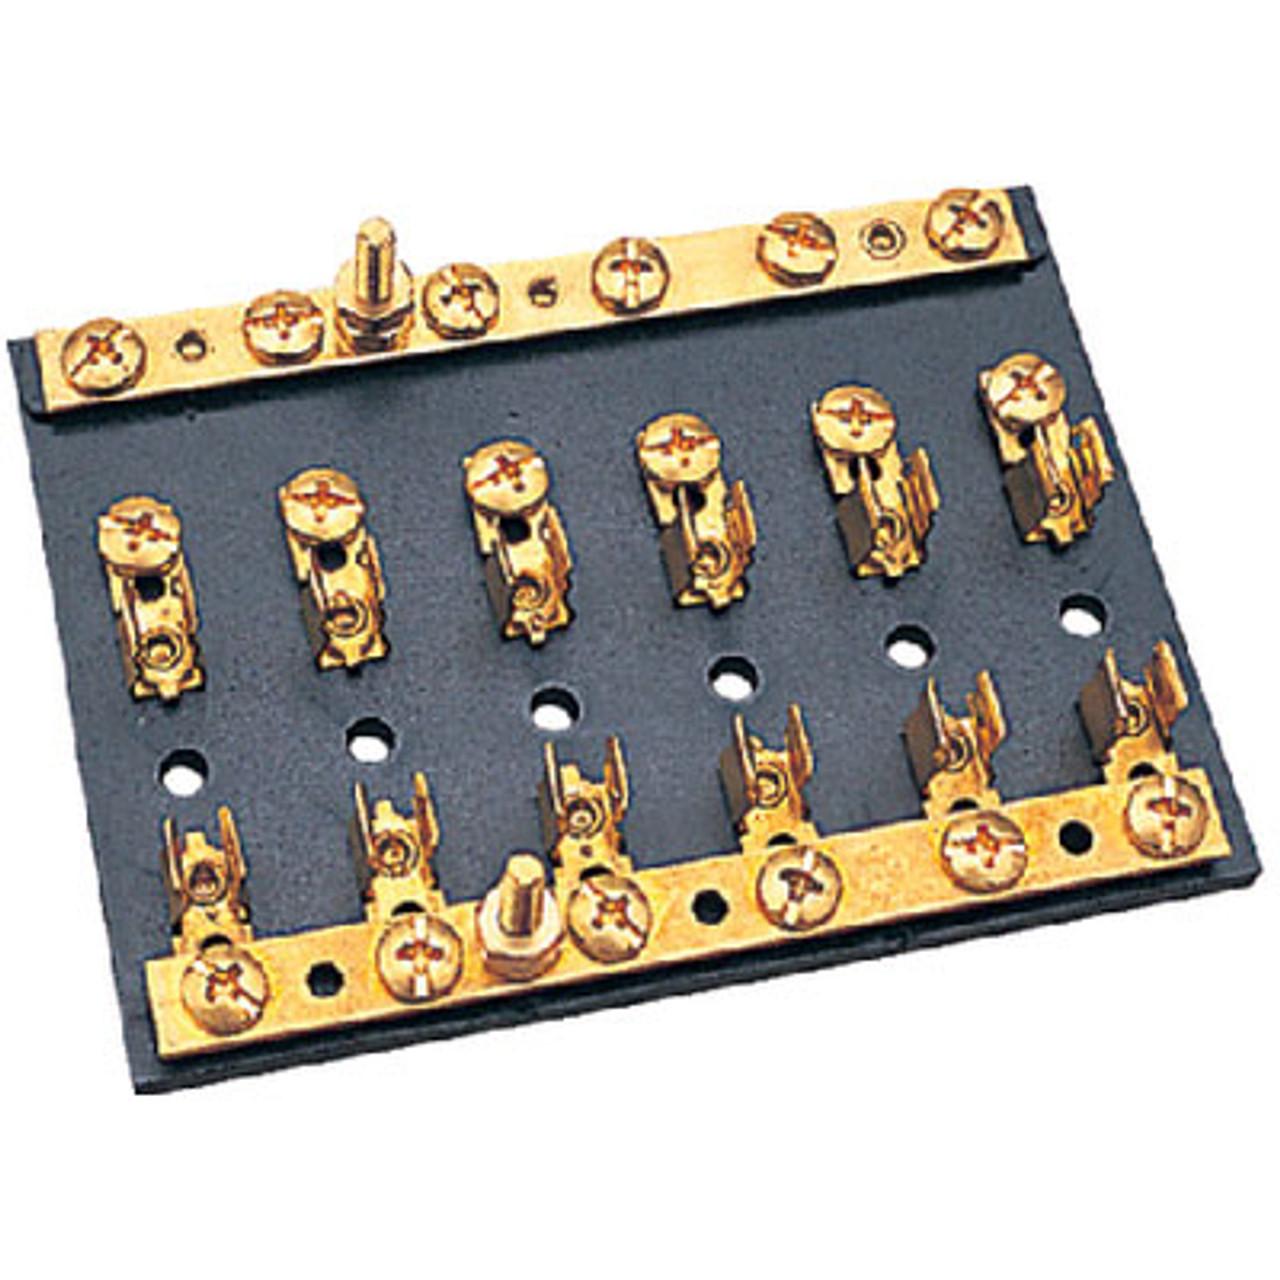 6 Terminal Fuse Block Bakelite Fuse Block w Brass Clips